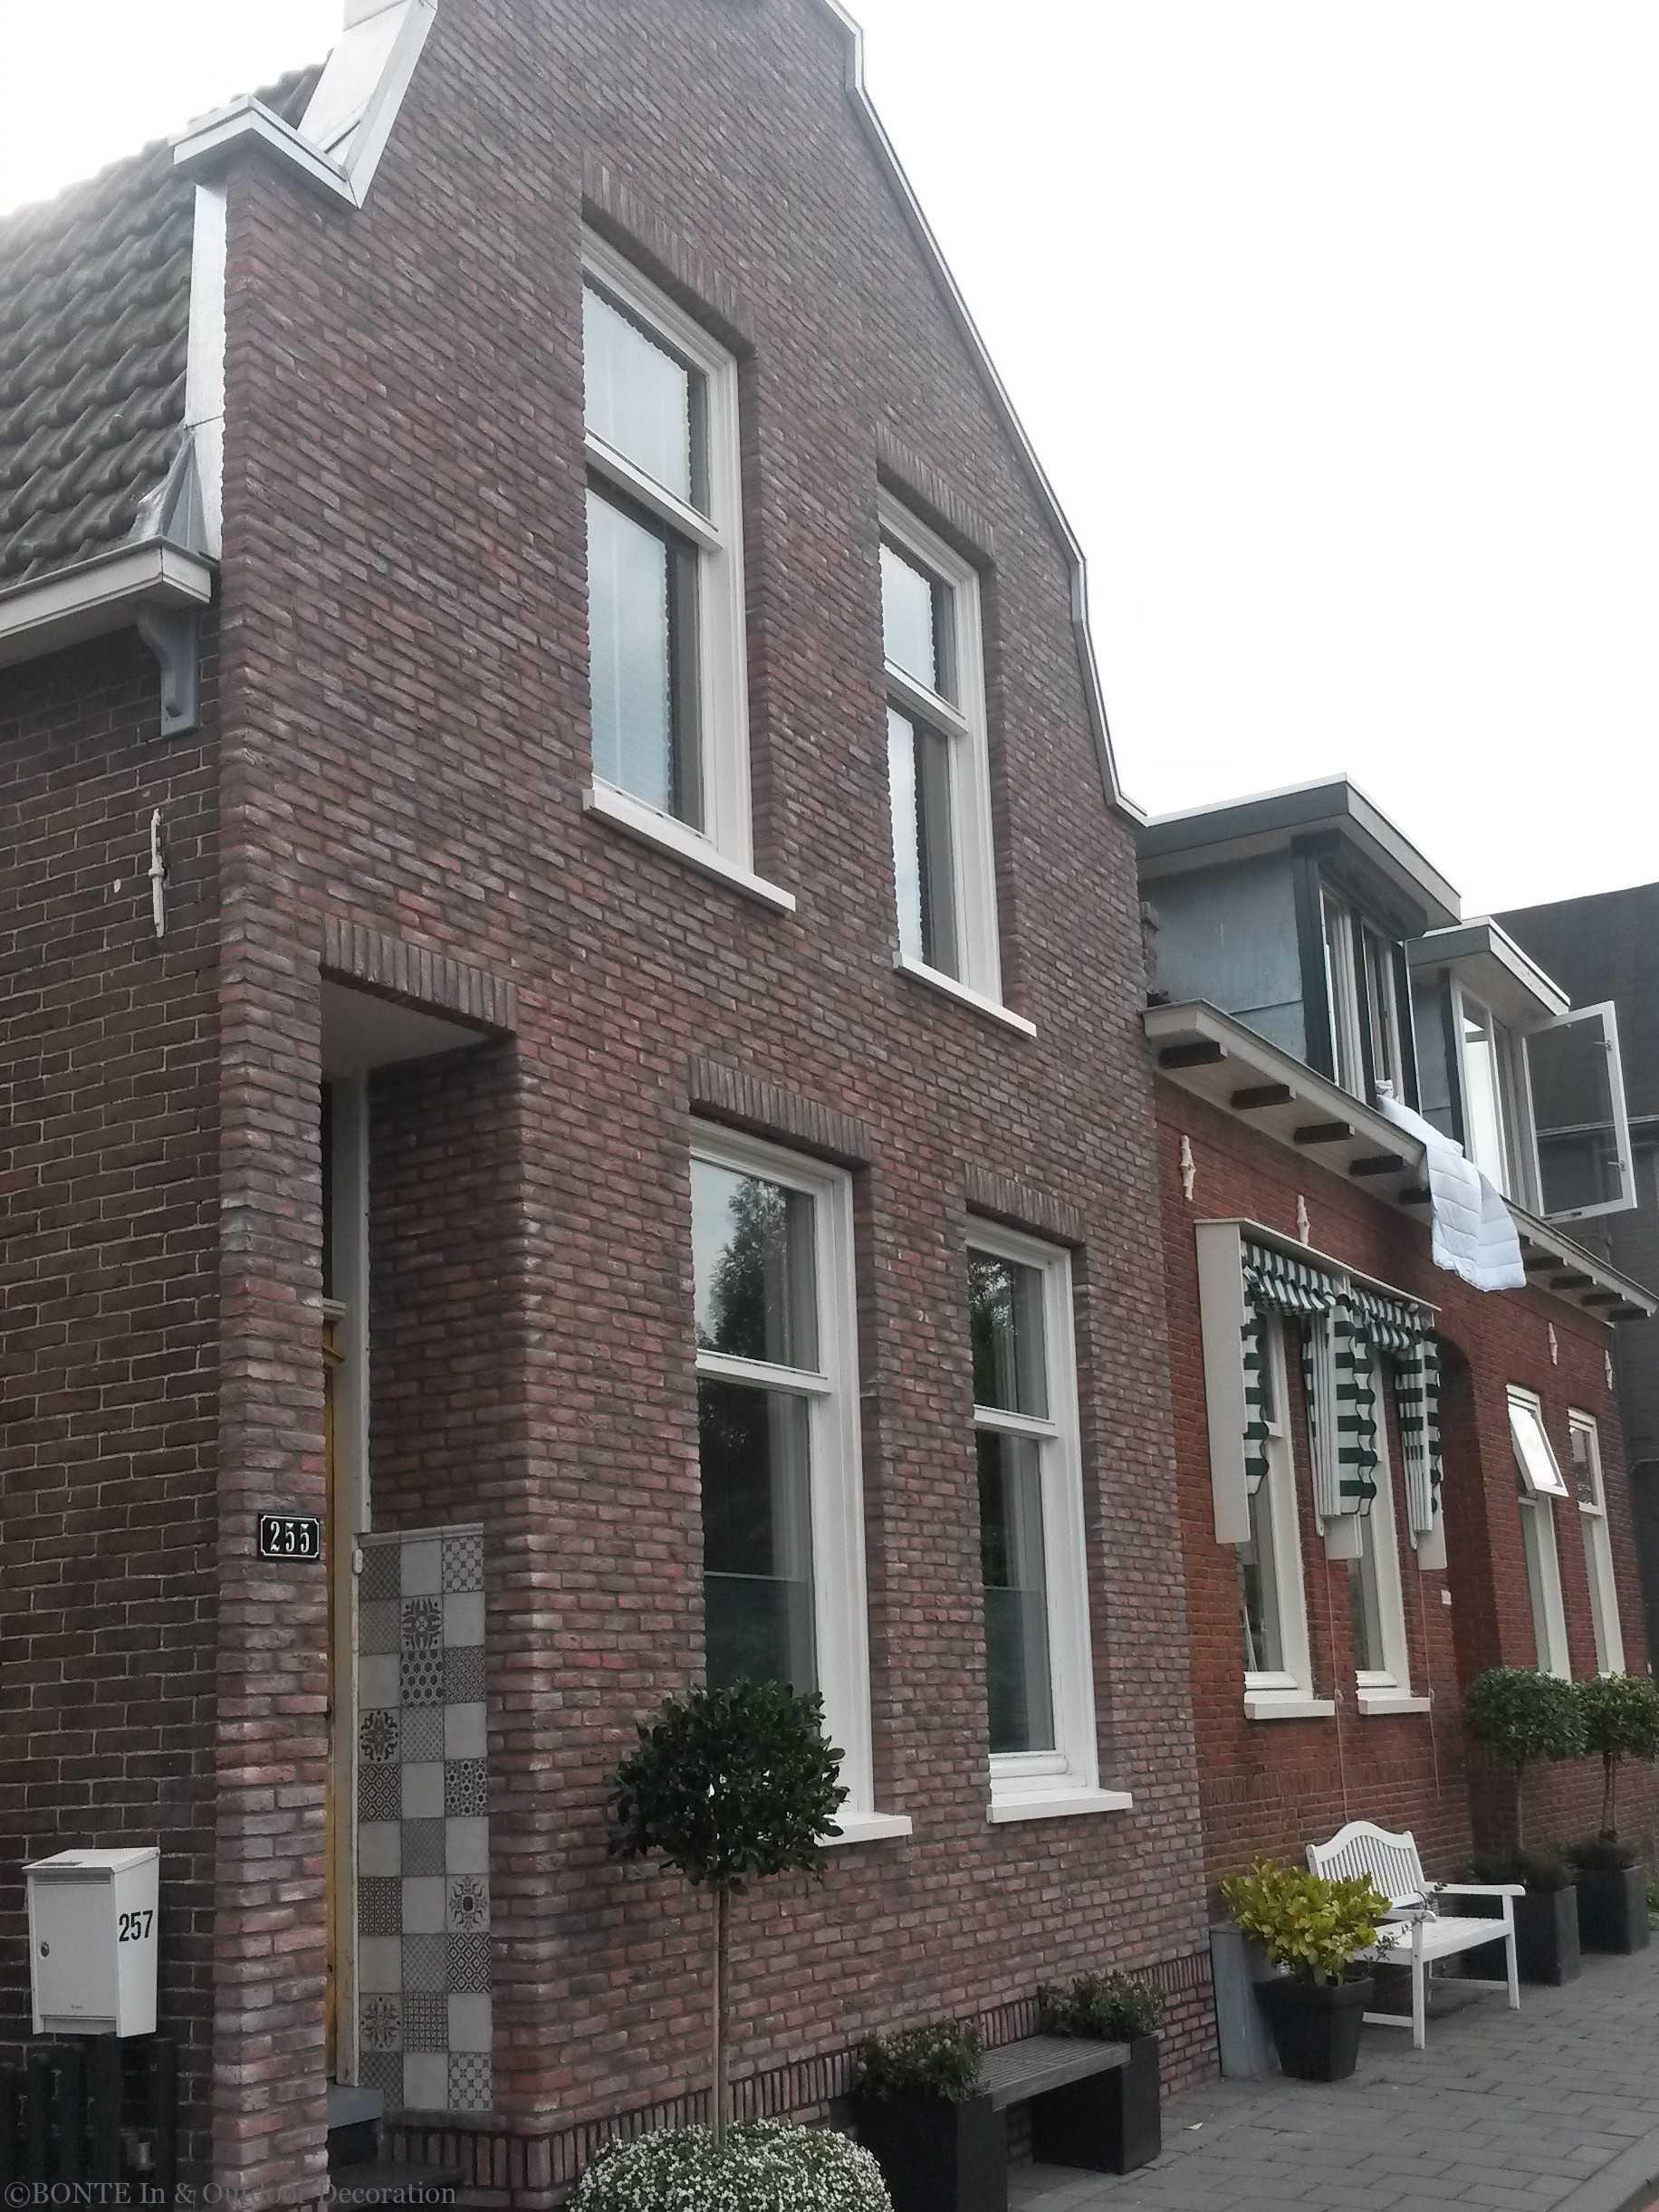 BONTE Antieke IJsselsteen Buitengevel BOskoop-2